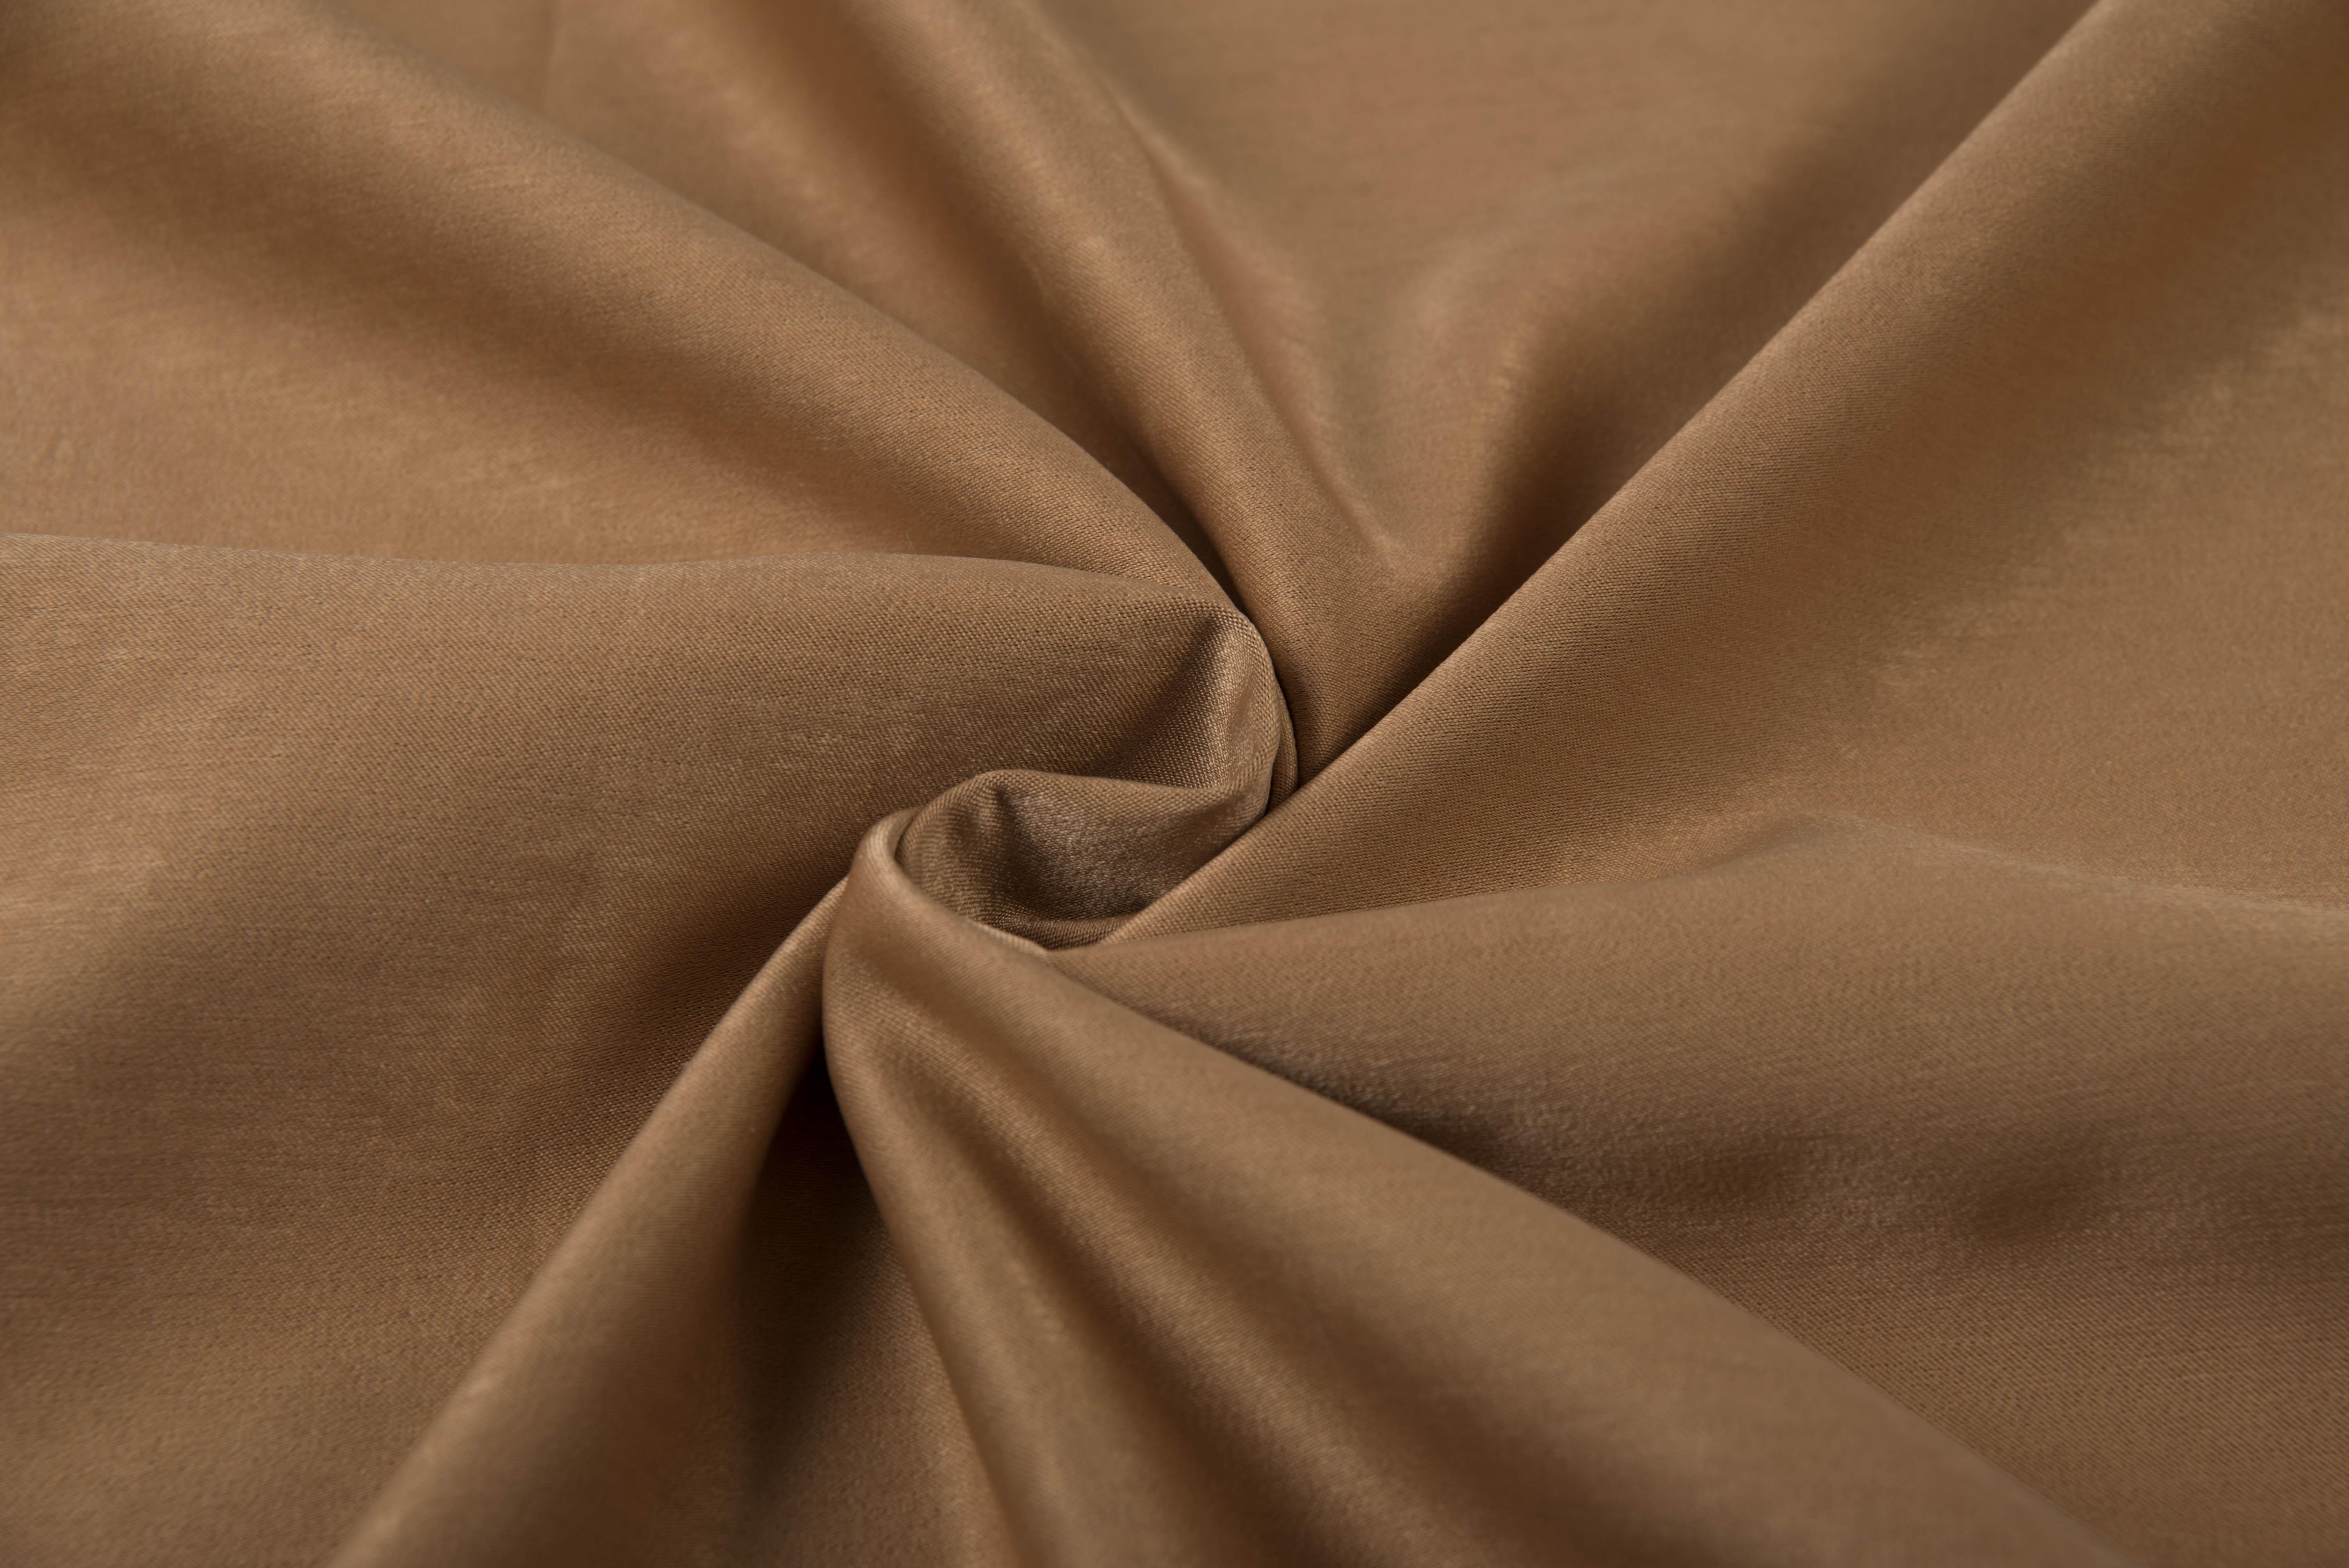 {} TexRepublic Материал Бархат Wet Silk Цвет: Коричневый texrepublic материал бархат wet silk цвет брусника